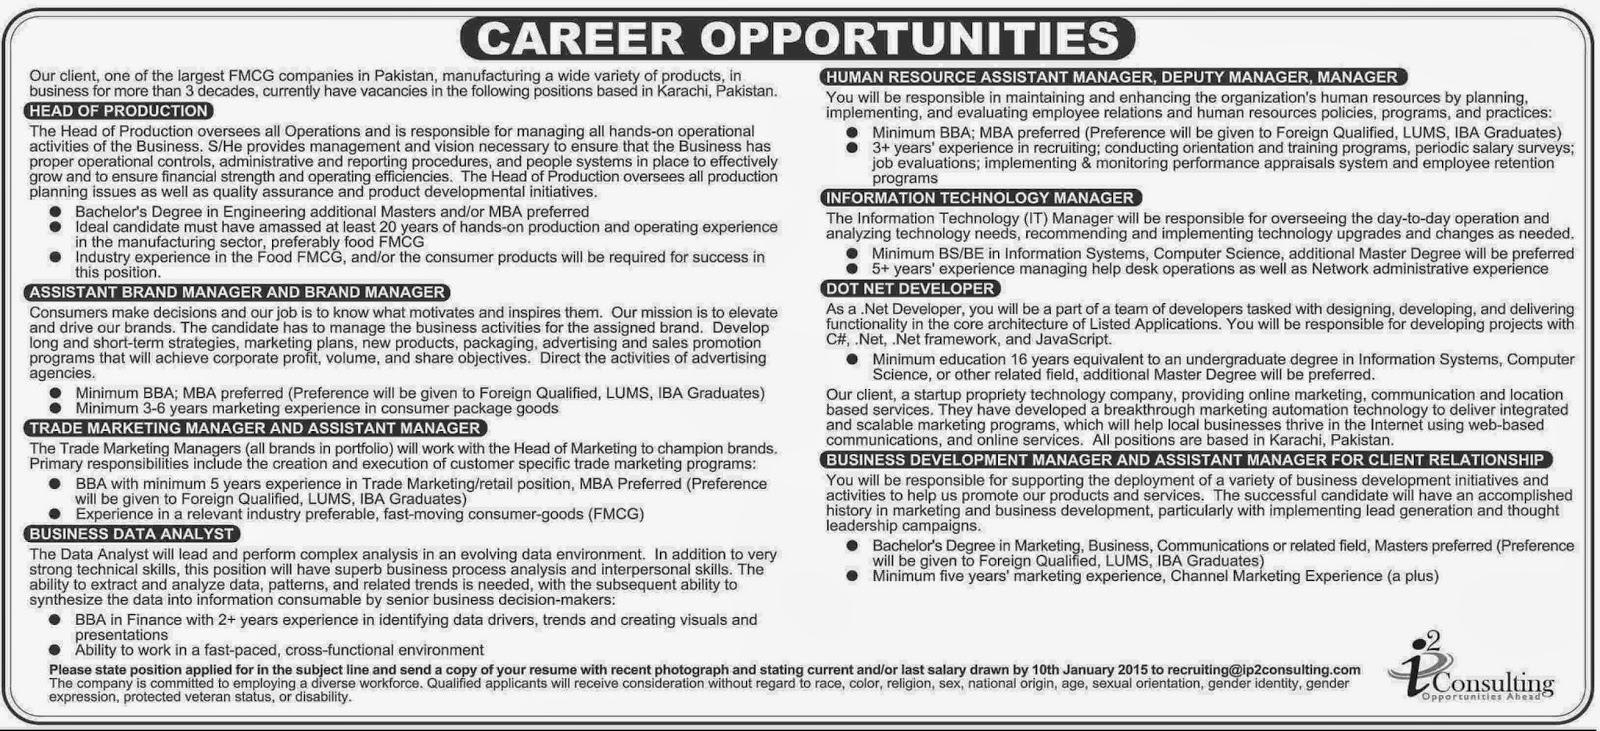 fmcg sector of pakistan Customer loyalty in fmcg sector of pakistan khansa zaman, samina bibi, asma arshad, aqeel shahzad riphah international university, islamabad, pakistan khansazaman.